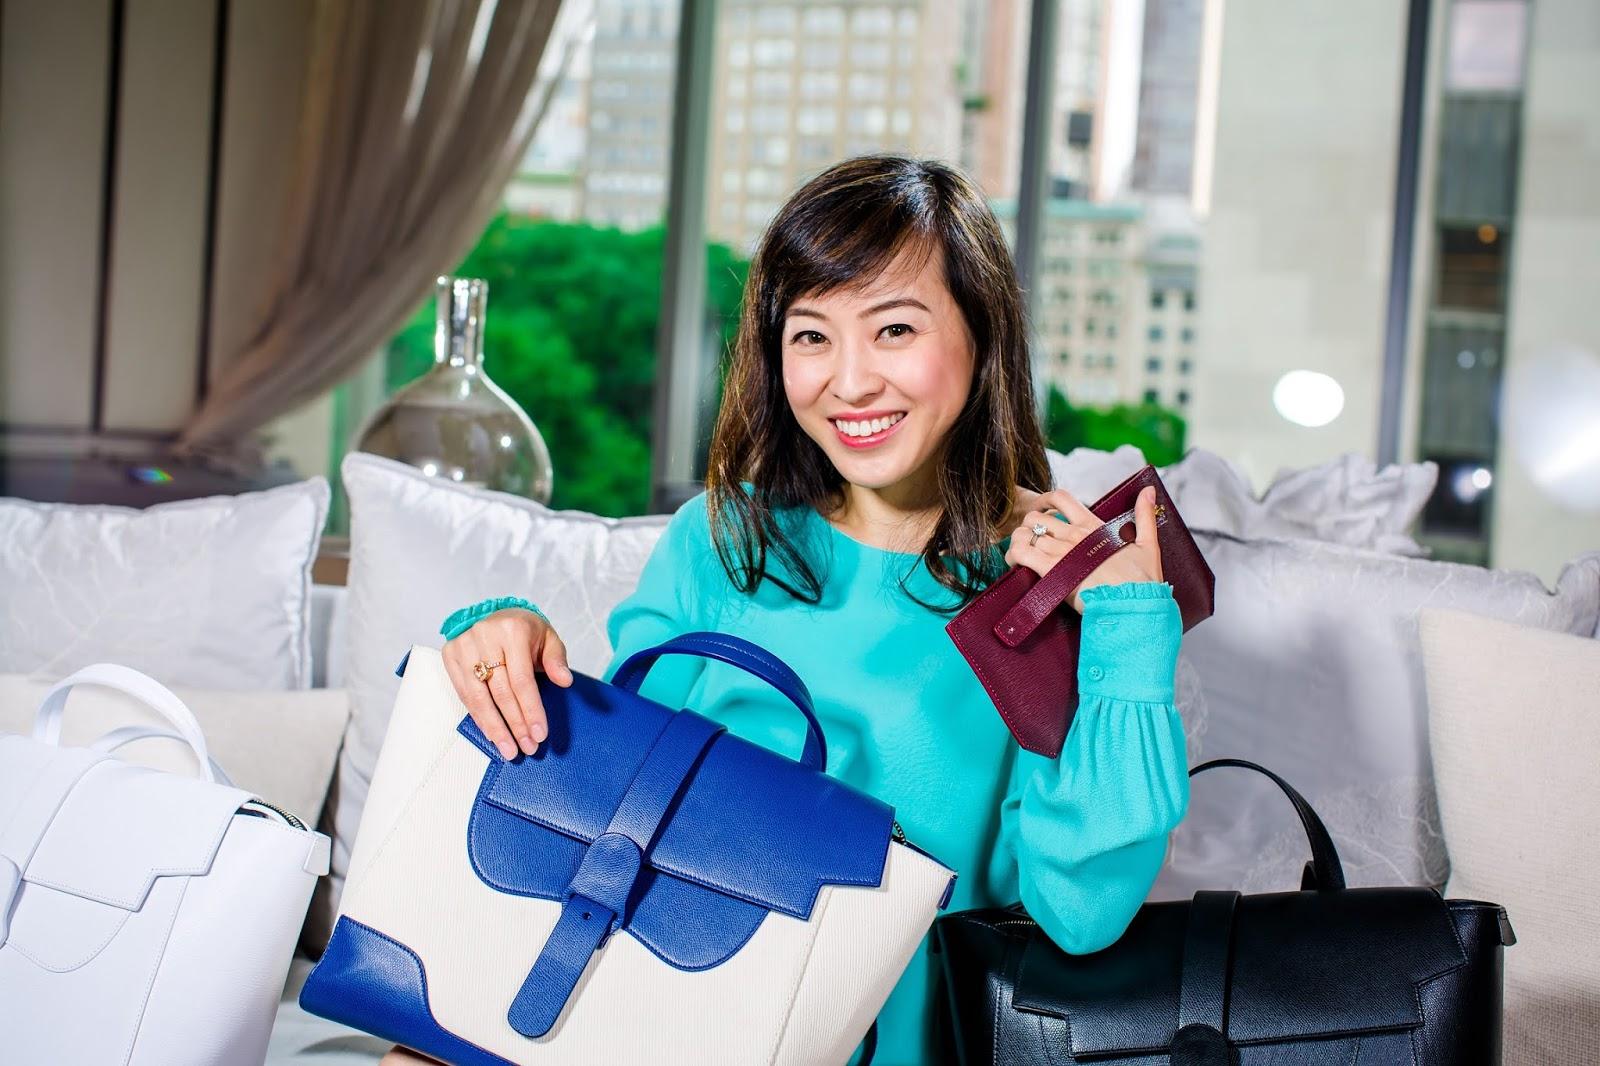 Coral Chung Loves Her Job at Senreve